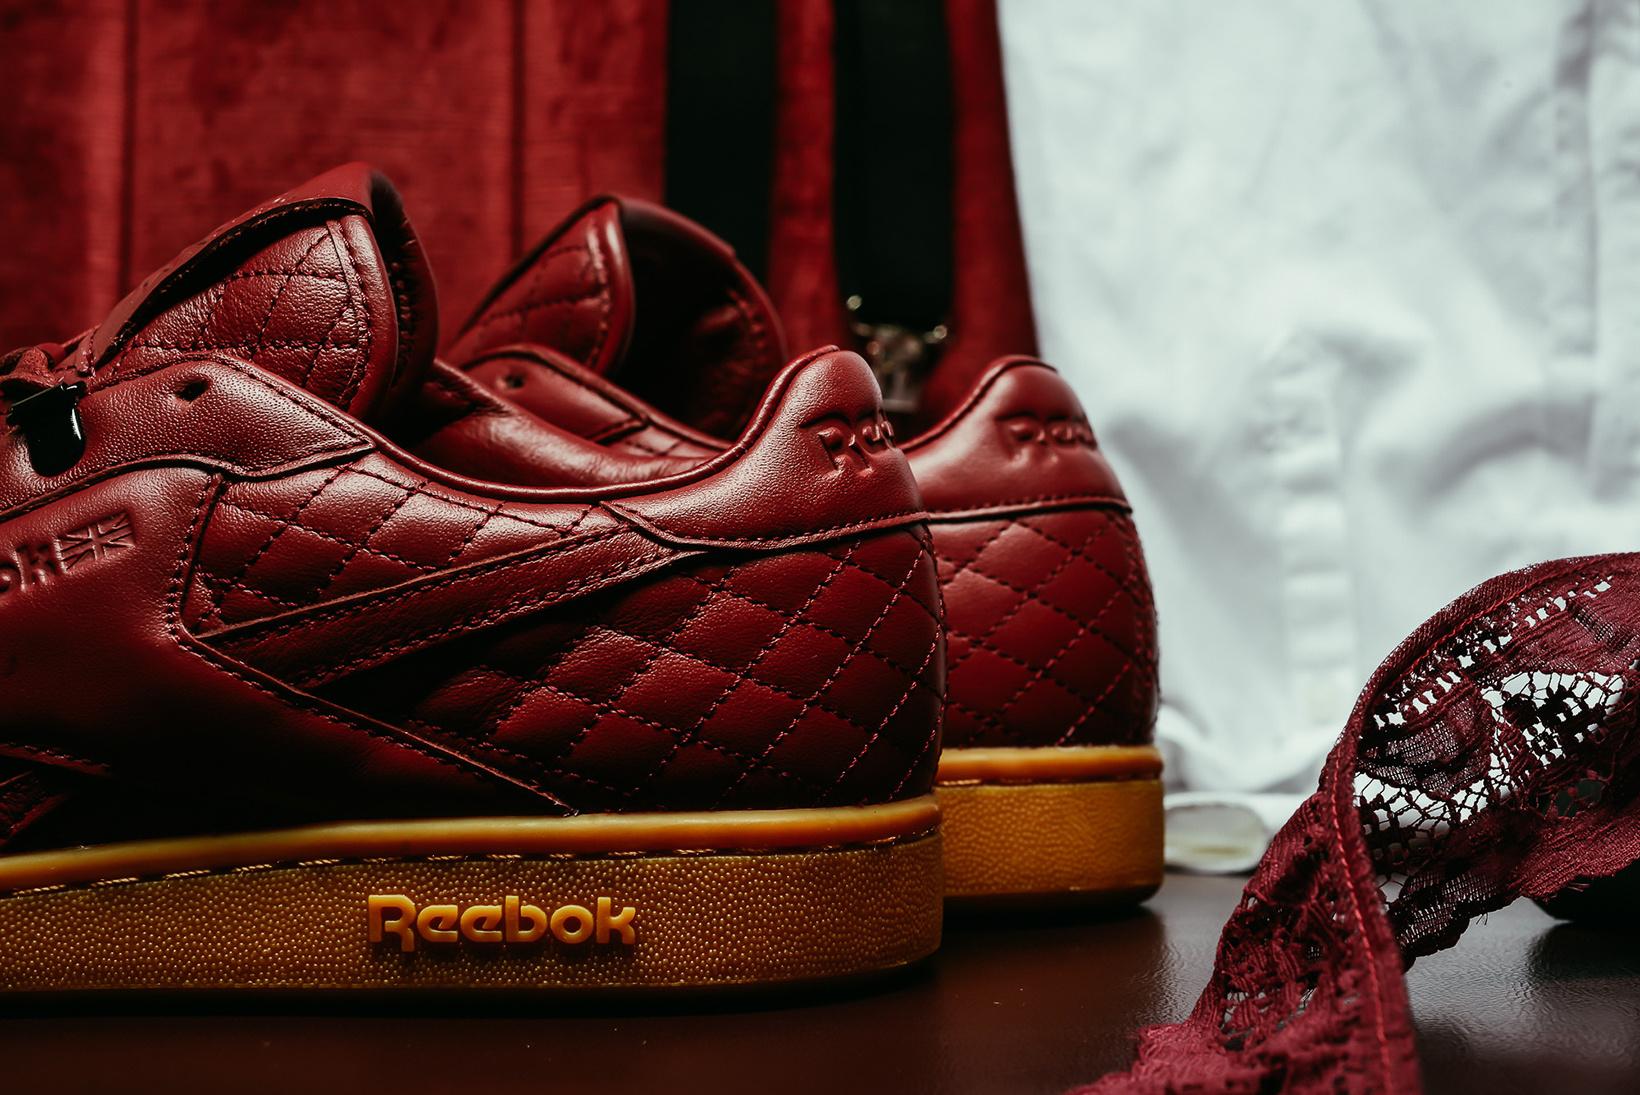 sneaker-politics-reebok-storyville-55 (1)